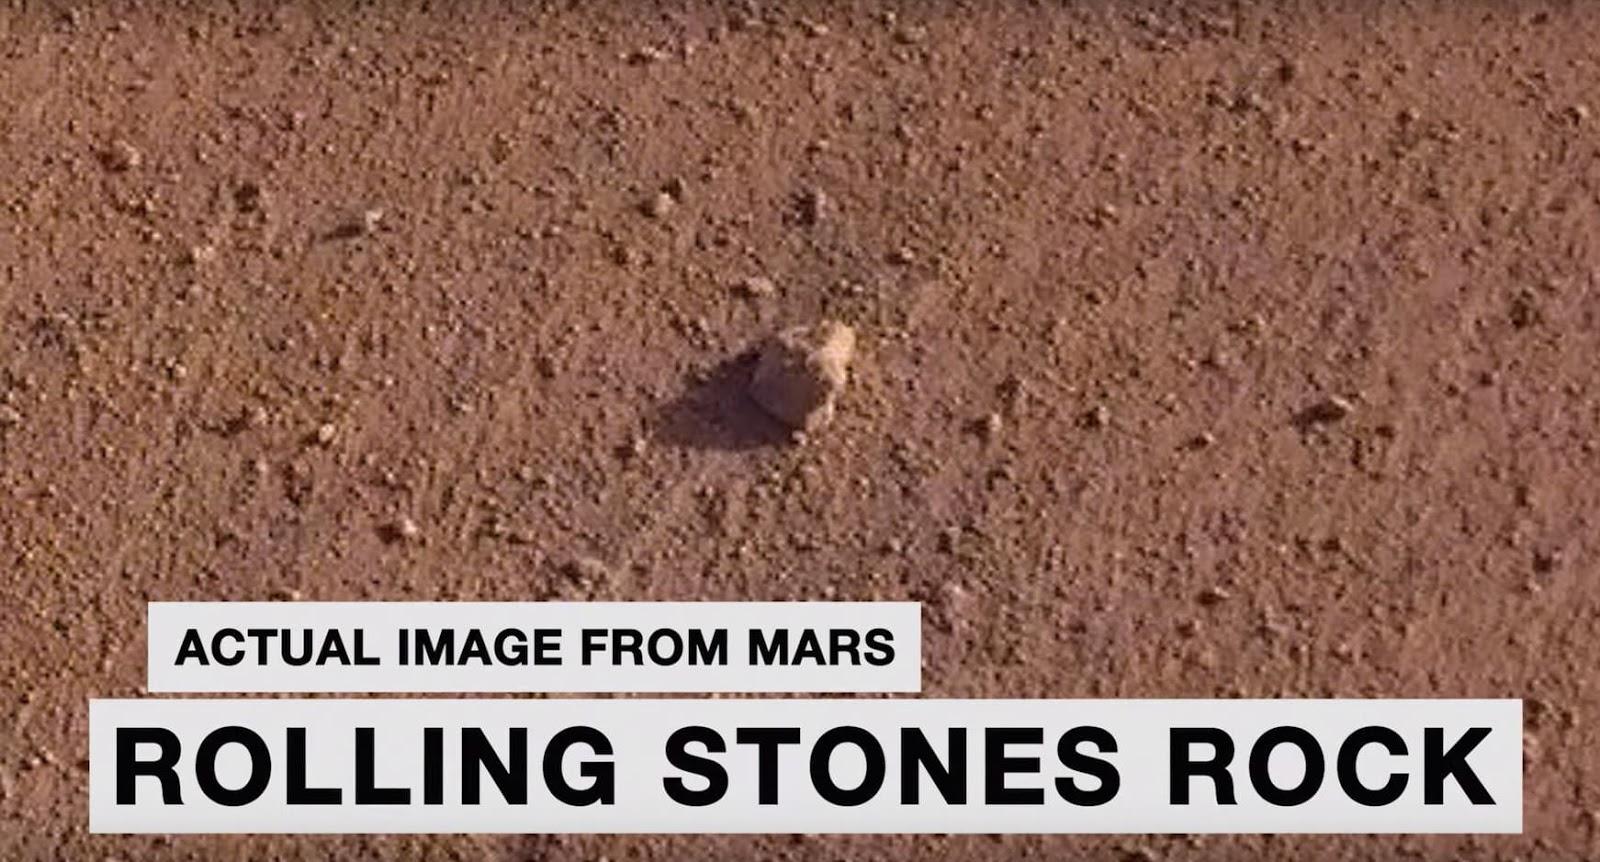 Nasa Jpl Verleiht Den Namen Rolling Stones Rock Auf Dem Mars Um